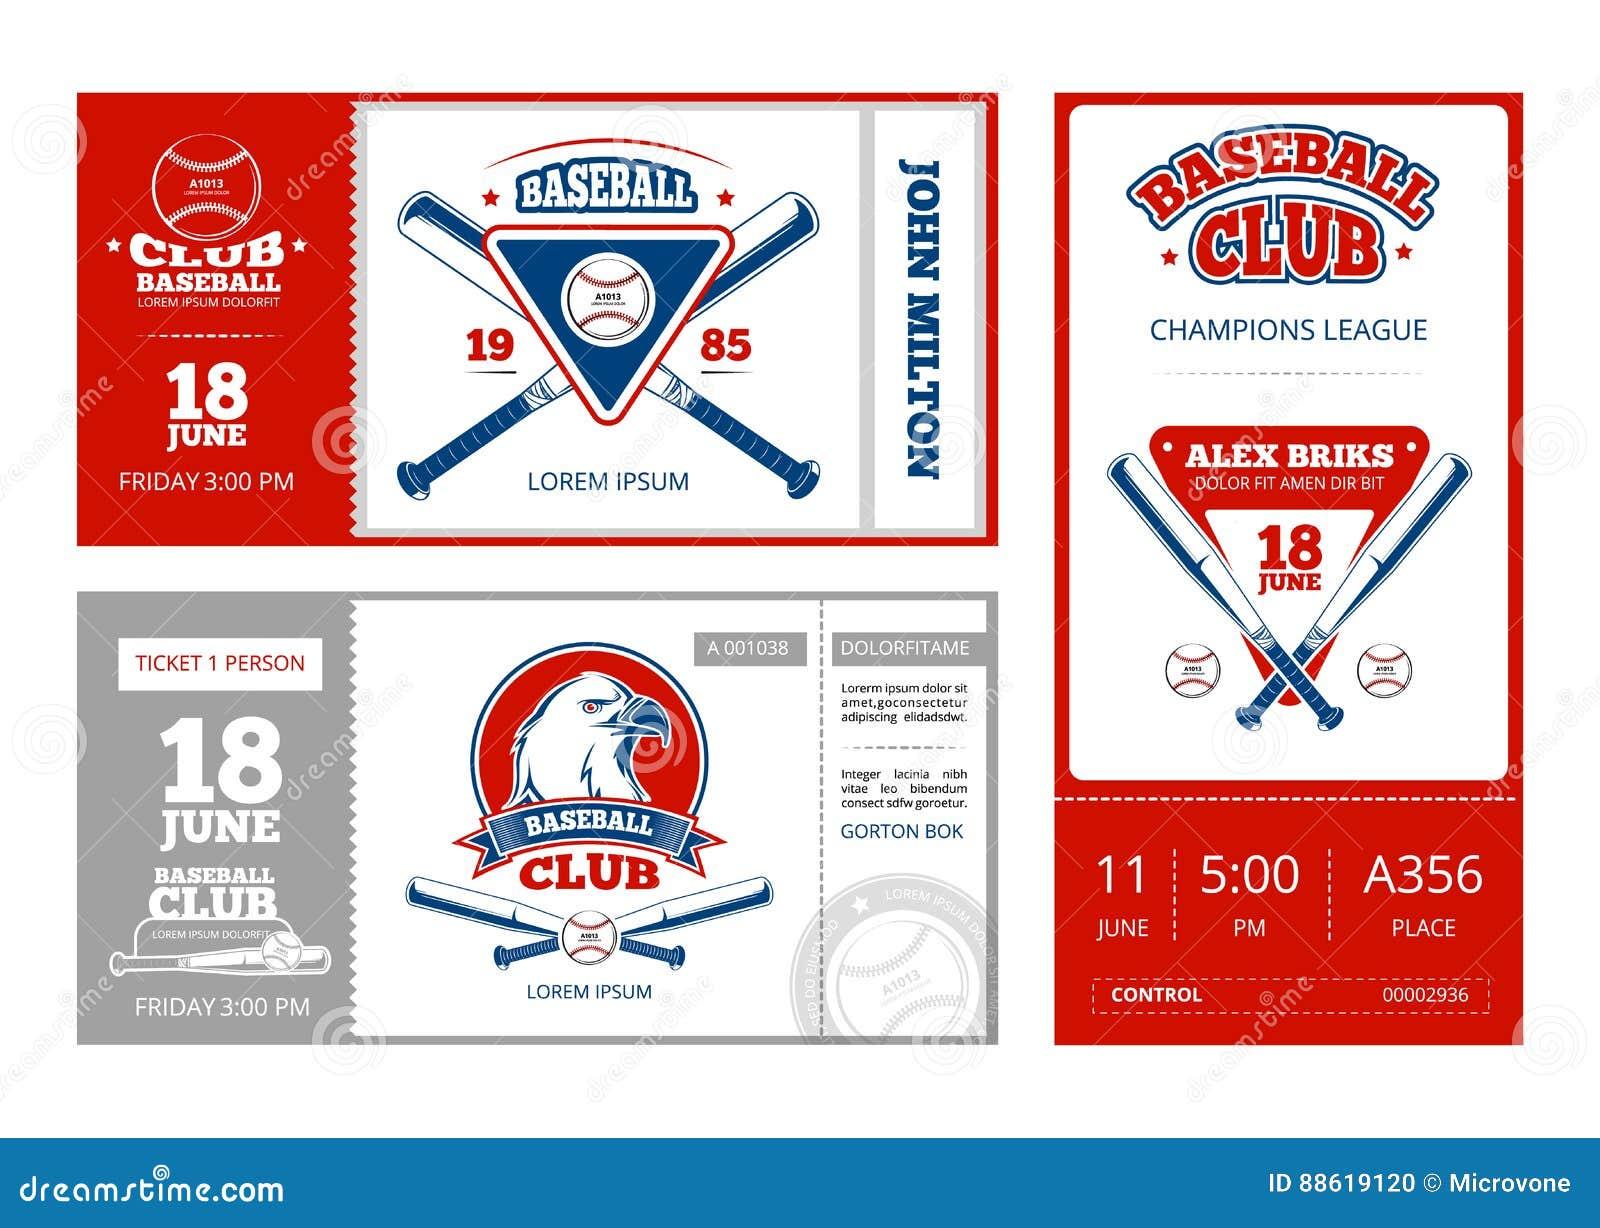 Baseball Sports Ticket Vector Design With Vintage Baseball Team ...